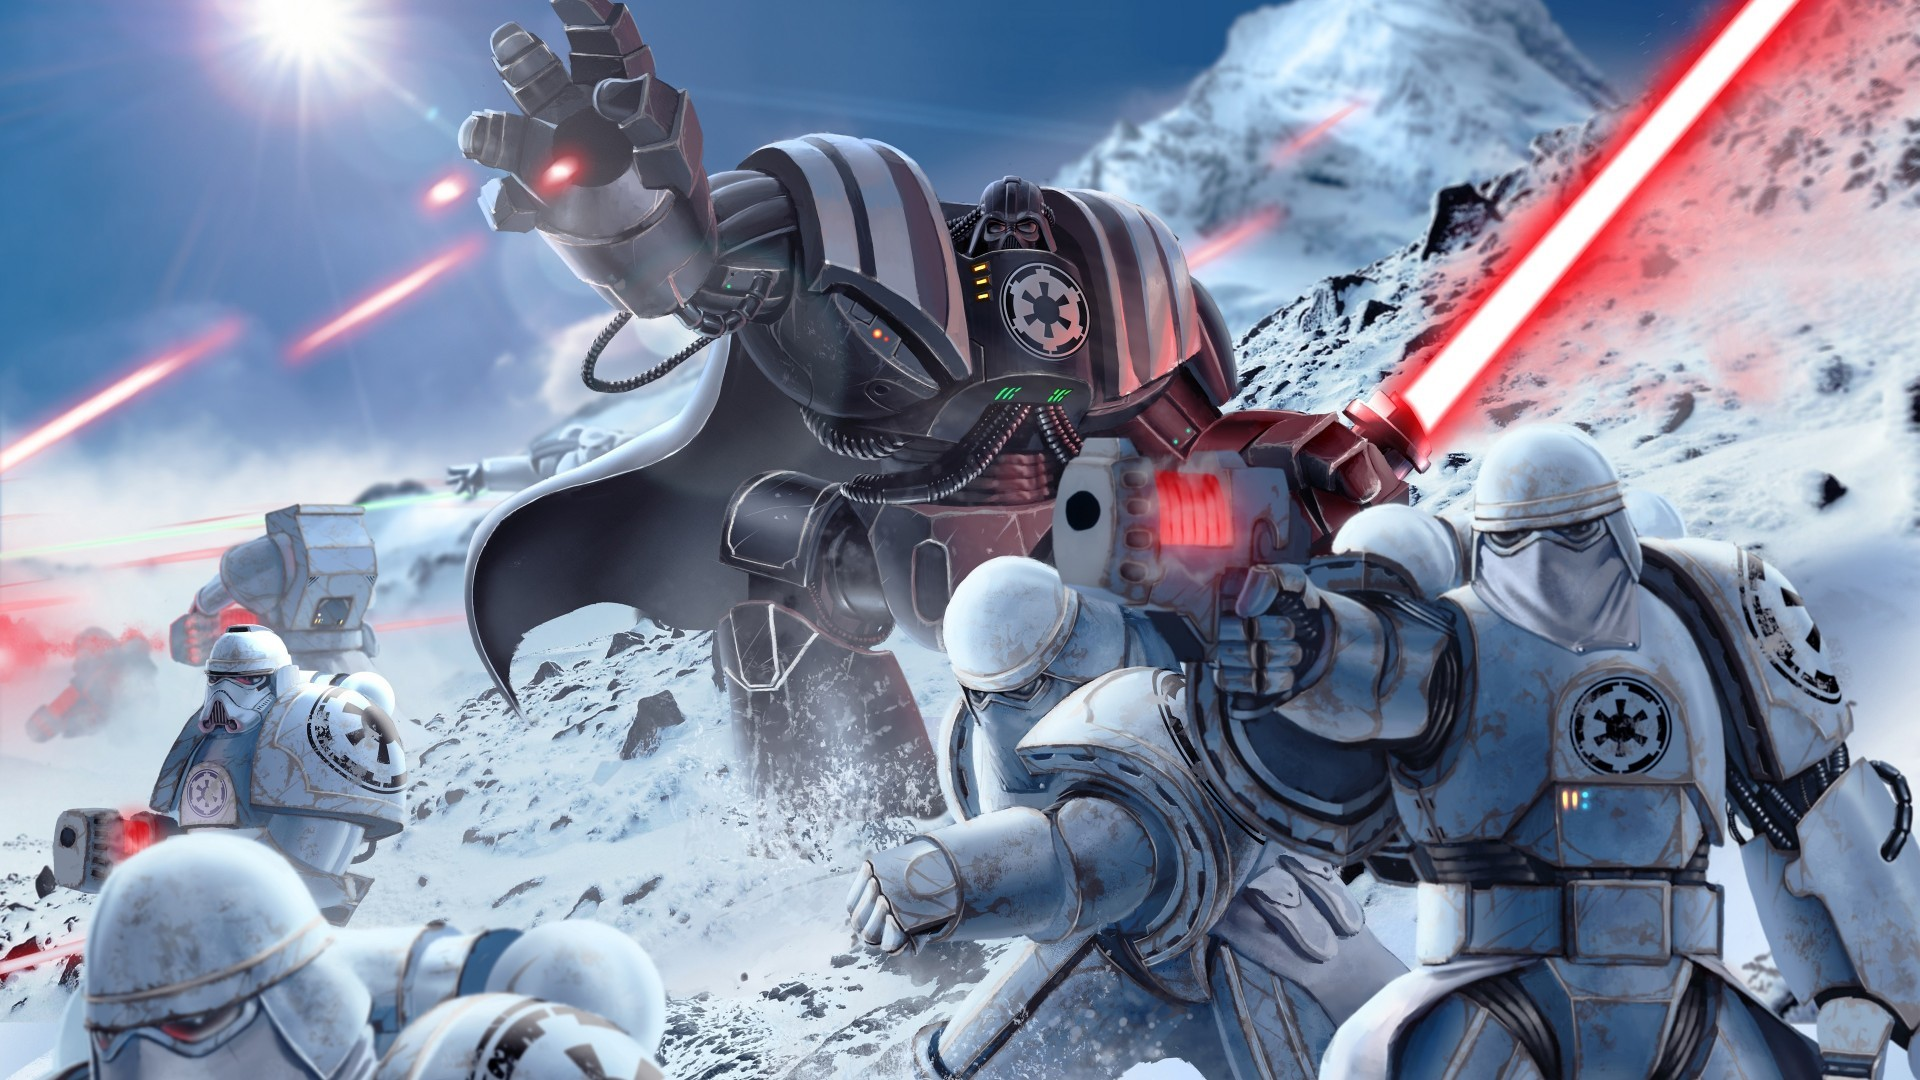 Warhammer Stormtroopers Darth Vader Wallpaper